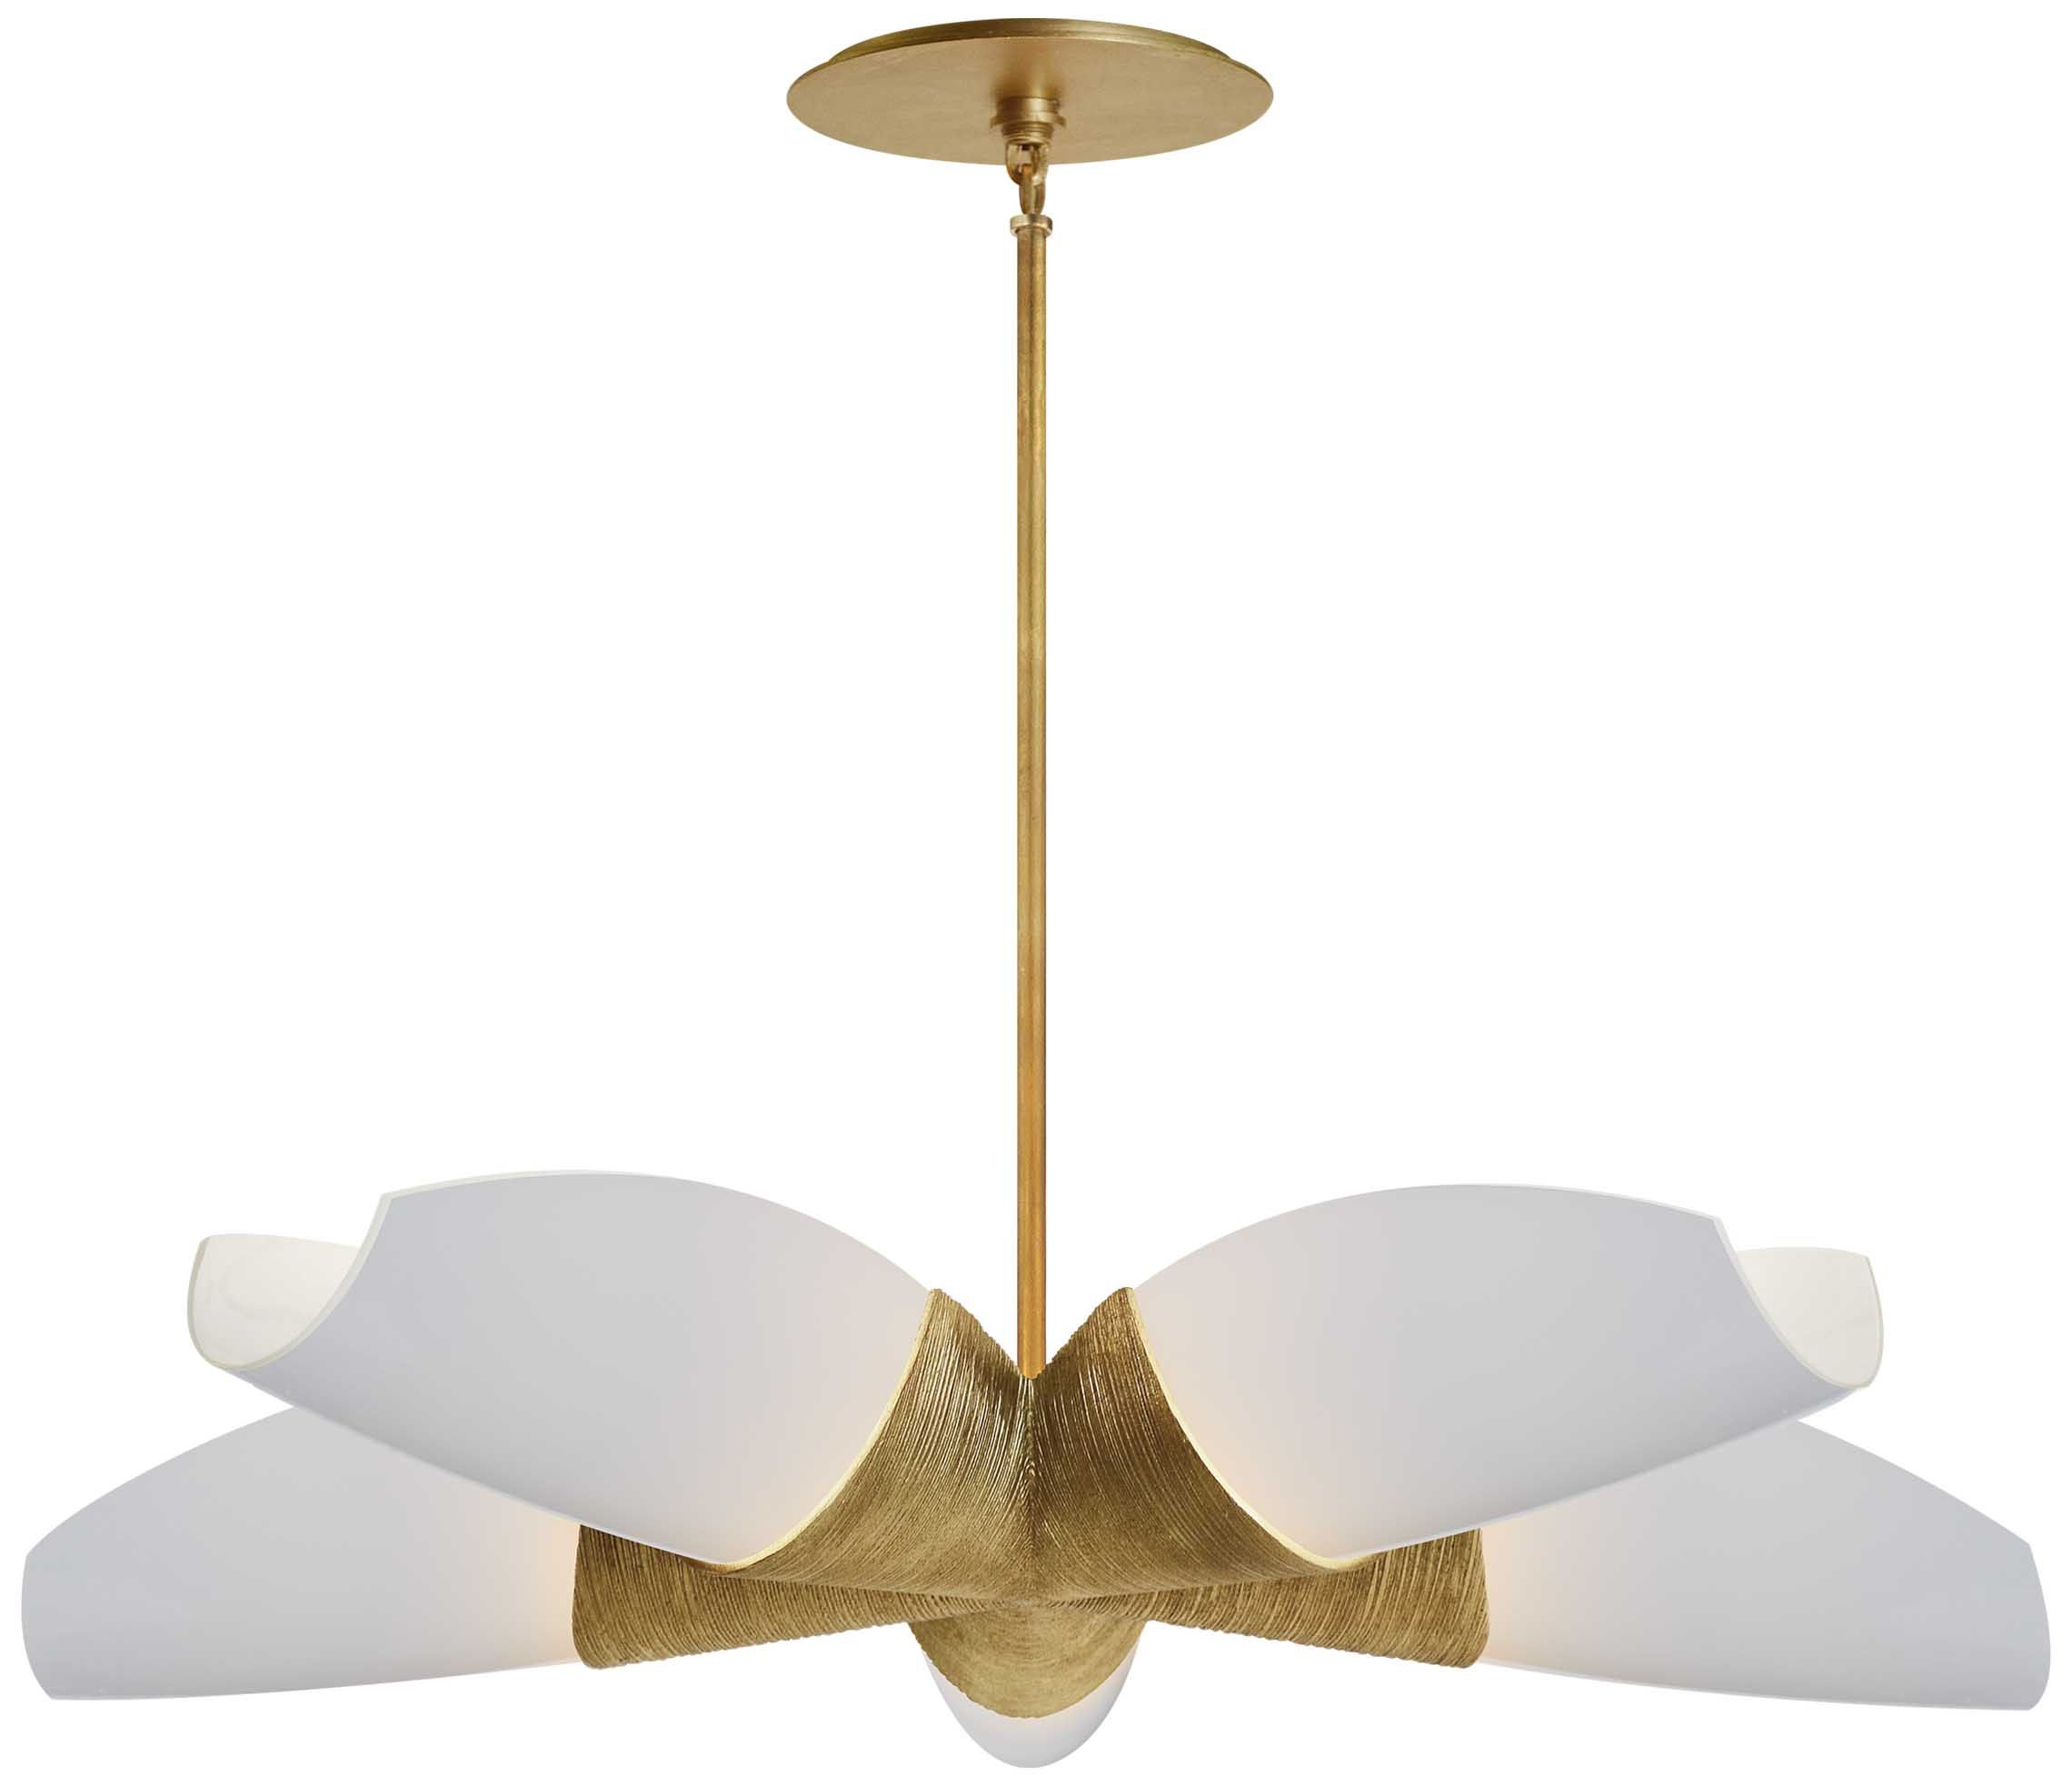 Utopia Medium 5 Arm Chandelier Gild High End Luxury Design Furniture And Decor Arm Chandelier Chandelier Ceiling Lights Kelly Wearstler